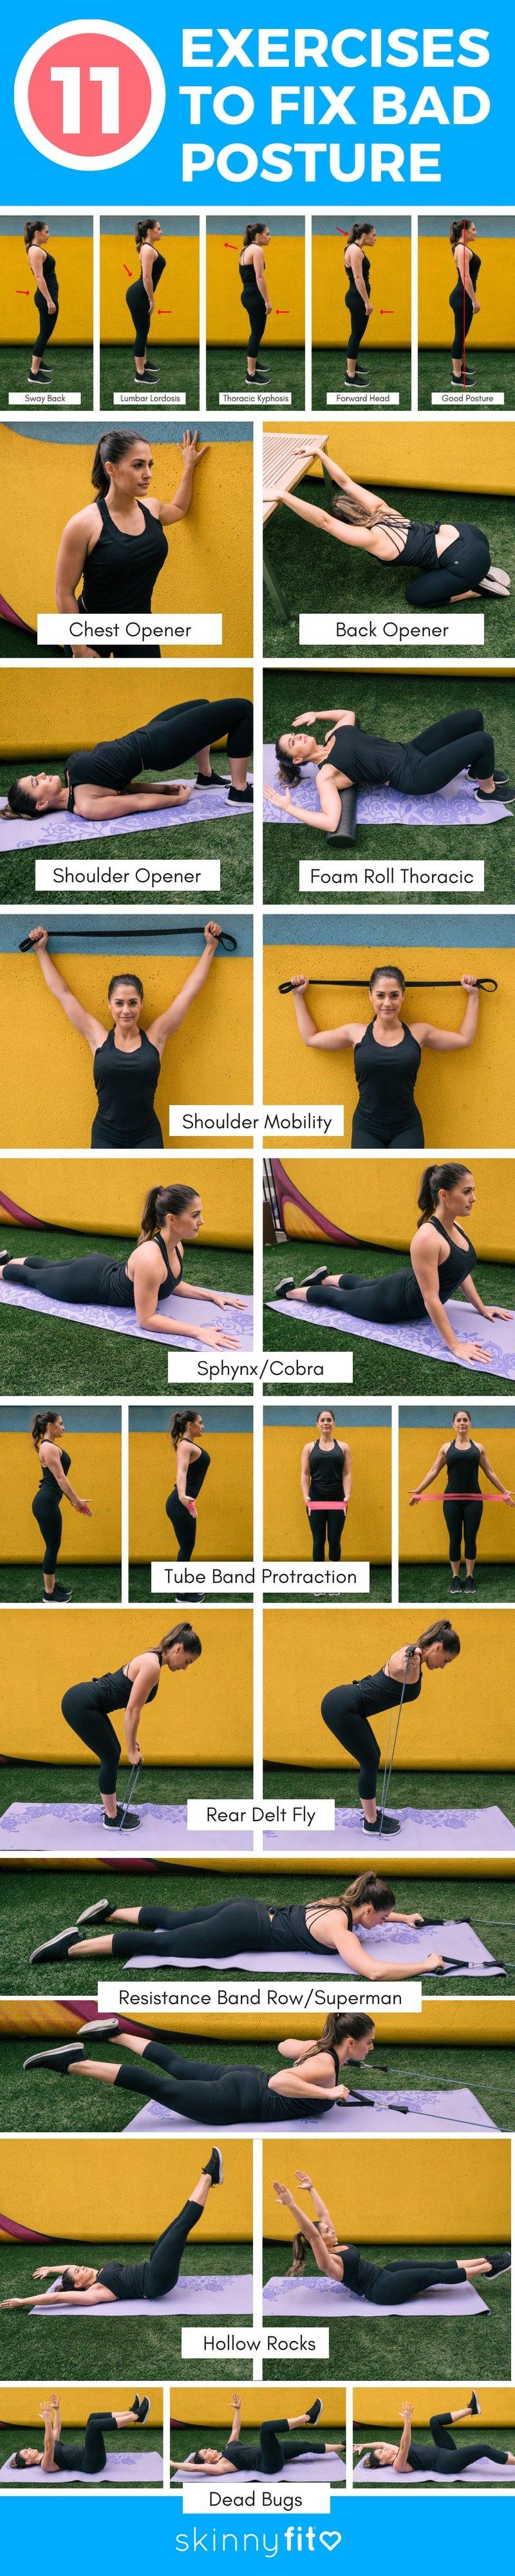 11 exercises to fix bad posture infographic